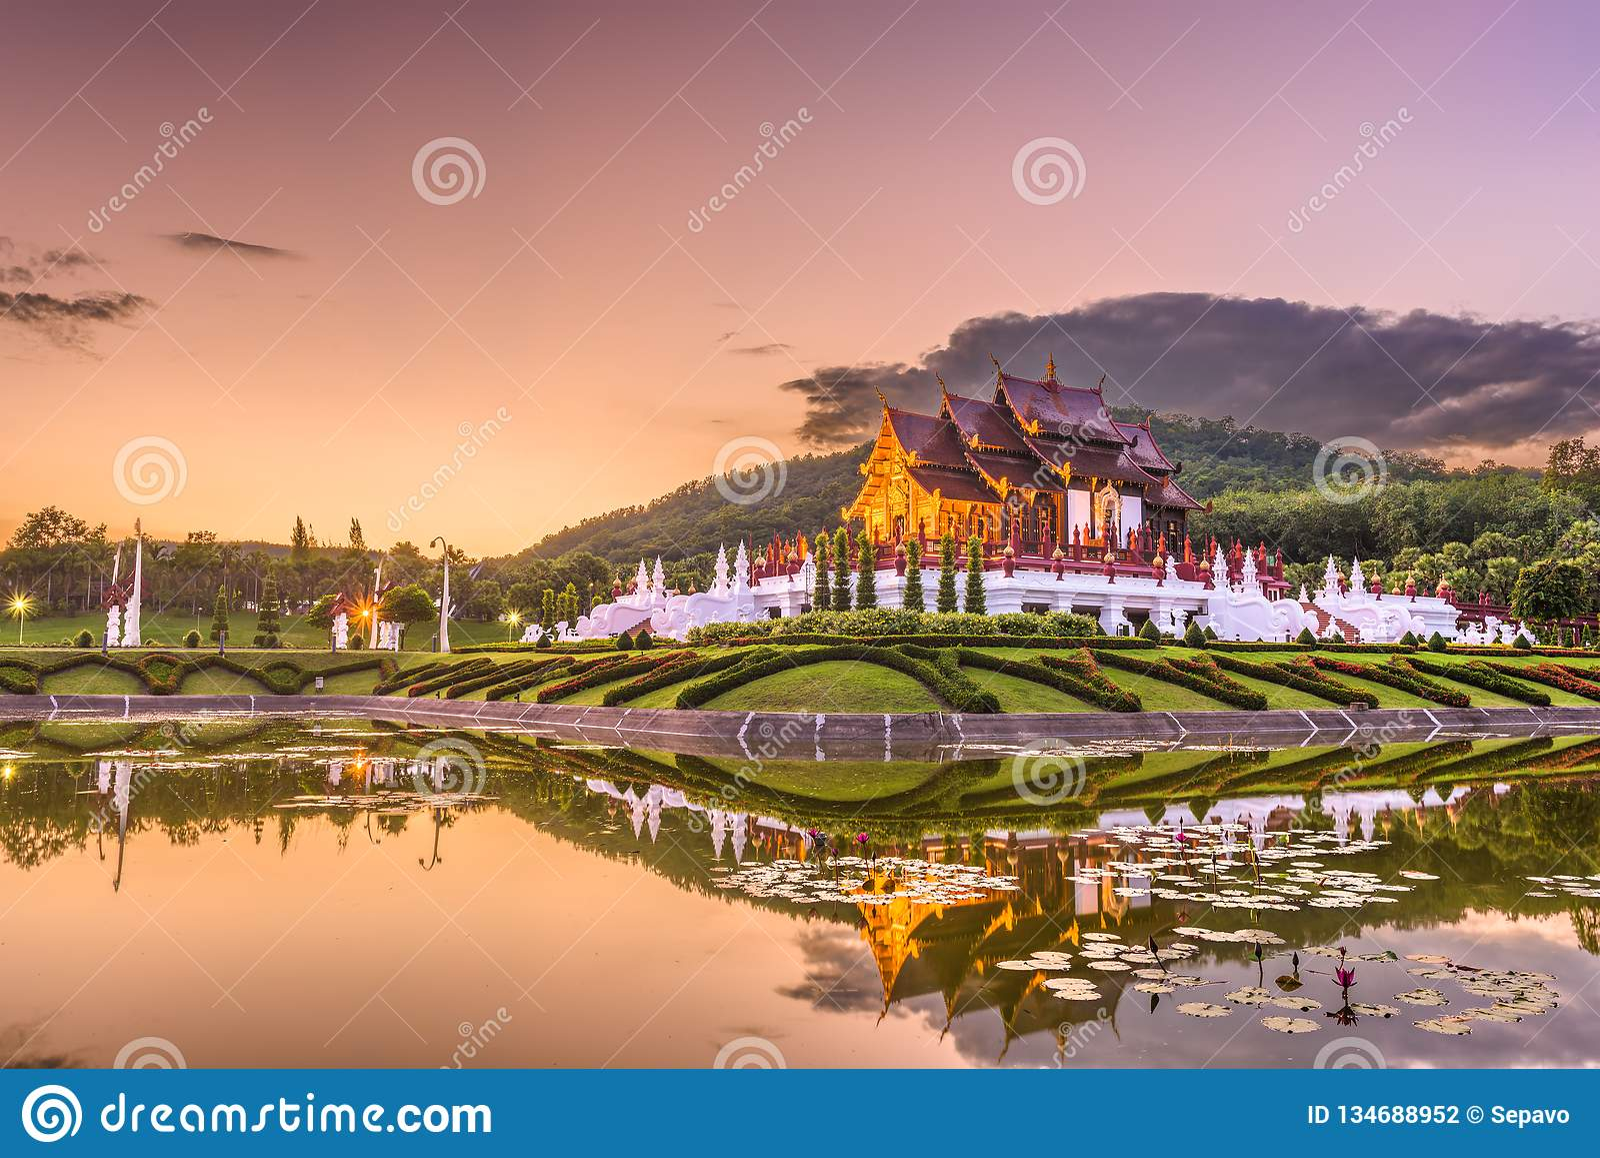 Chiang Mai, Thailand Park and Pavilion